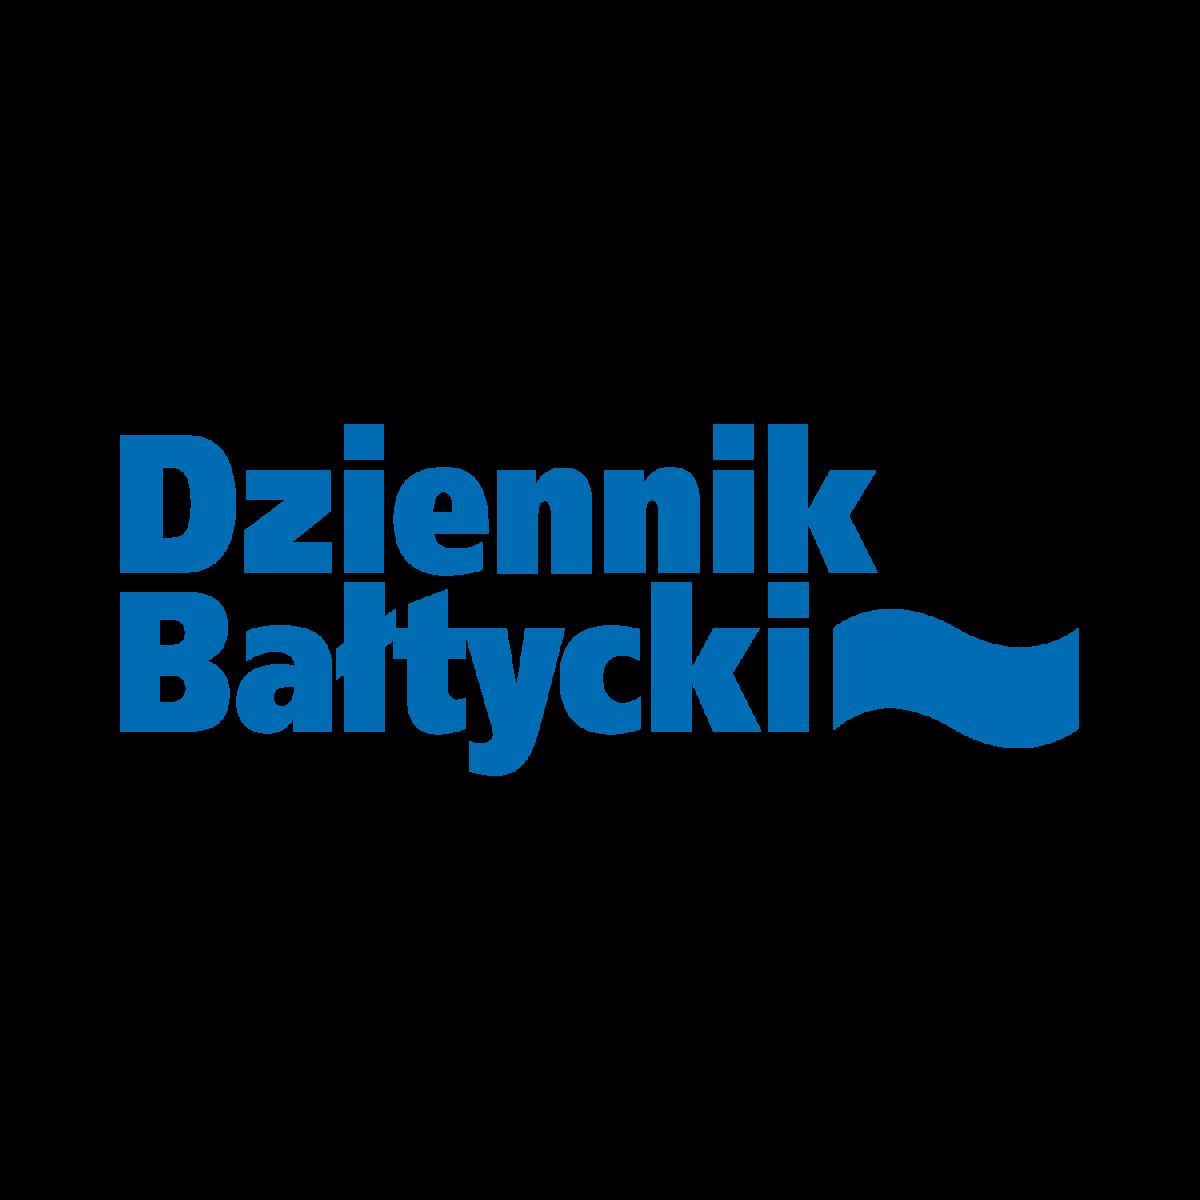 dziennikbaltycki-1-1200x1200.png